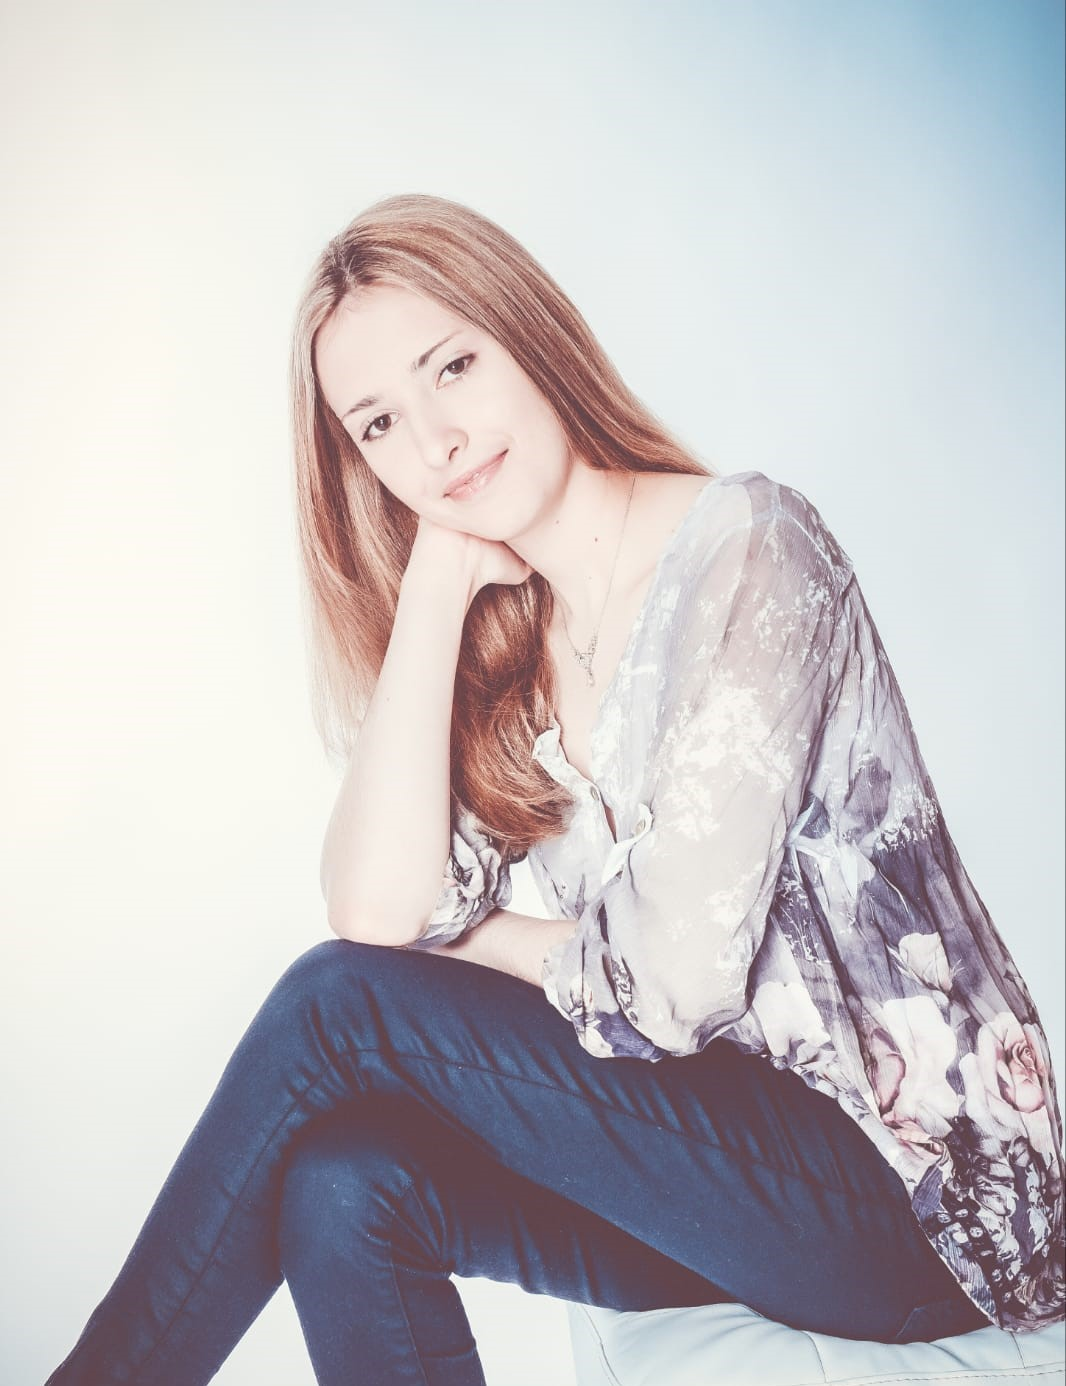 Sarah Bartenschlager